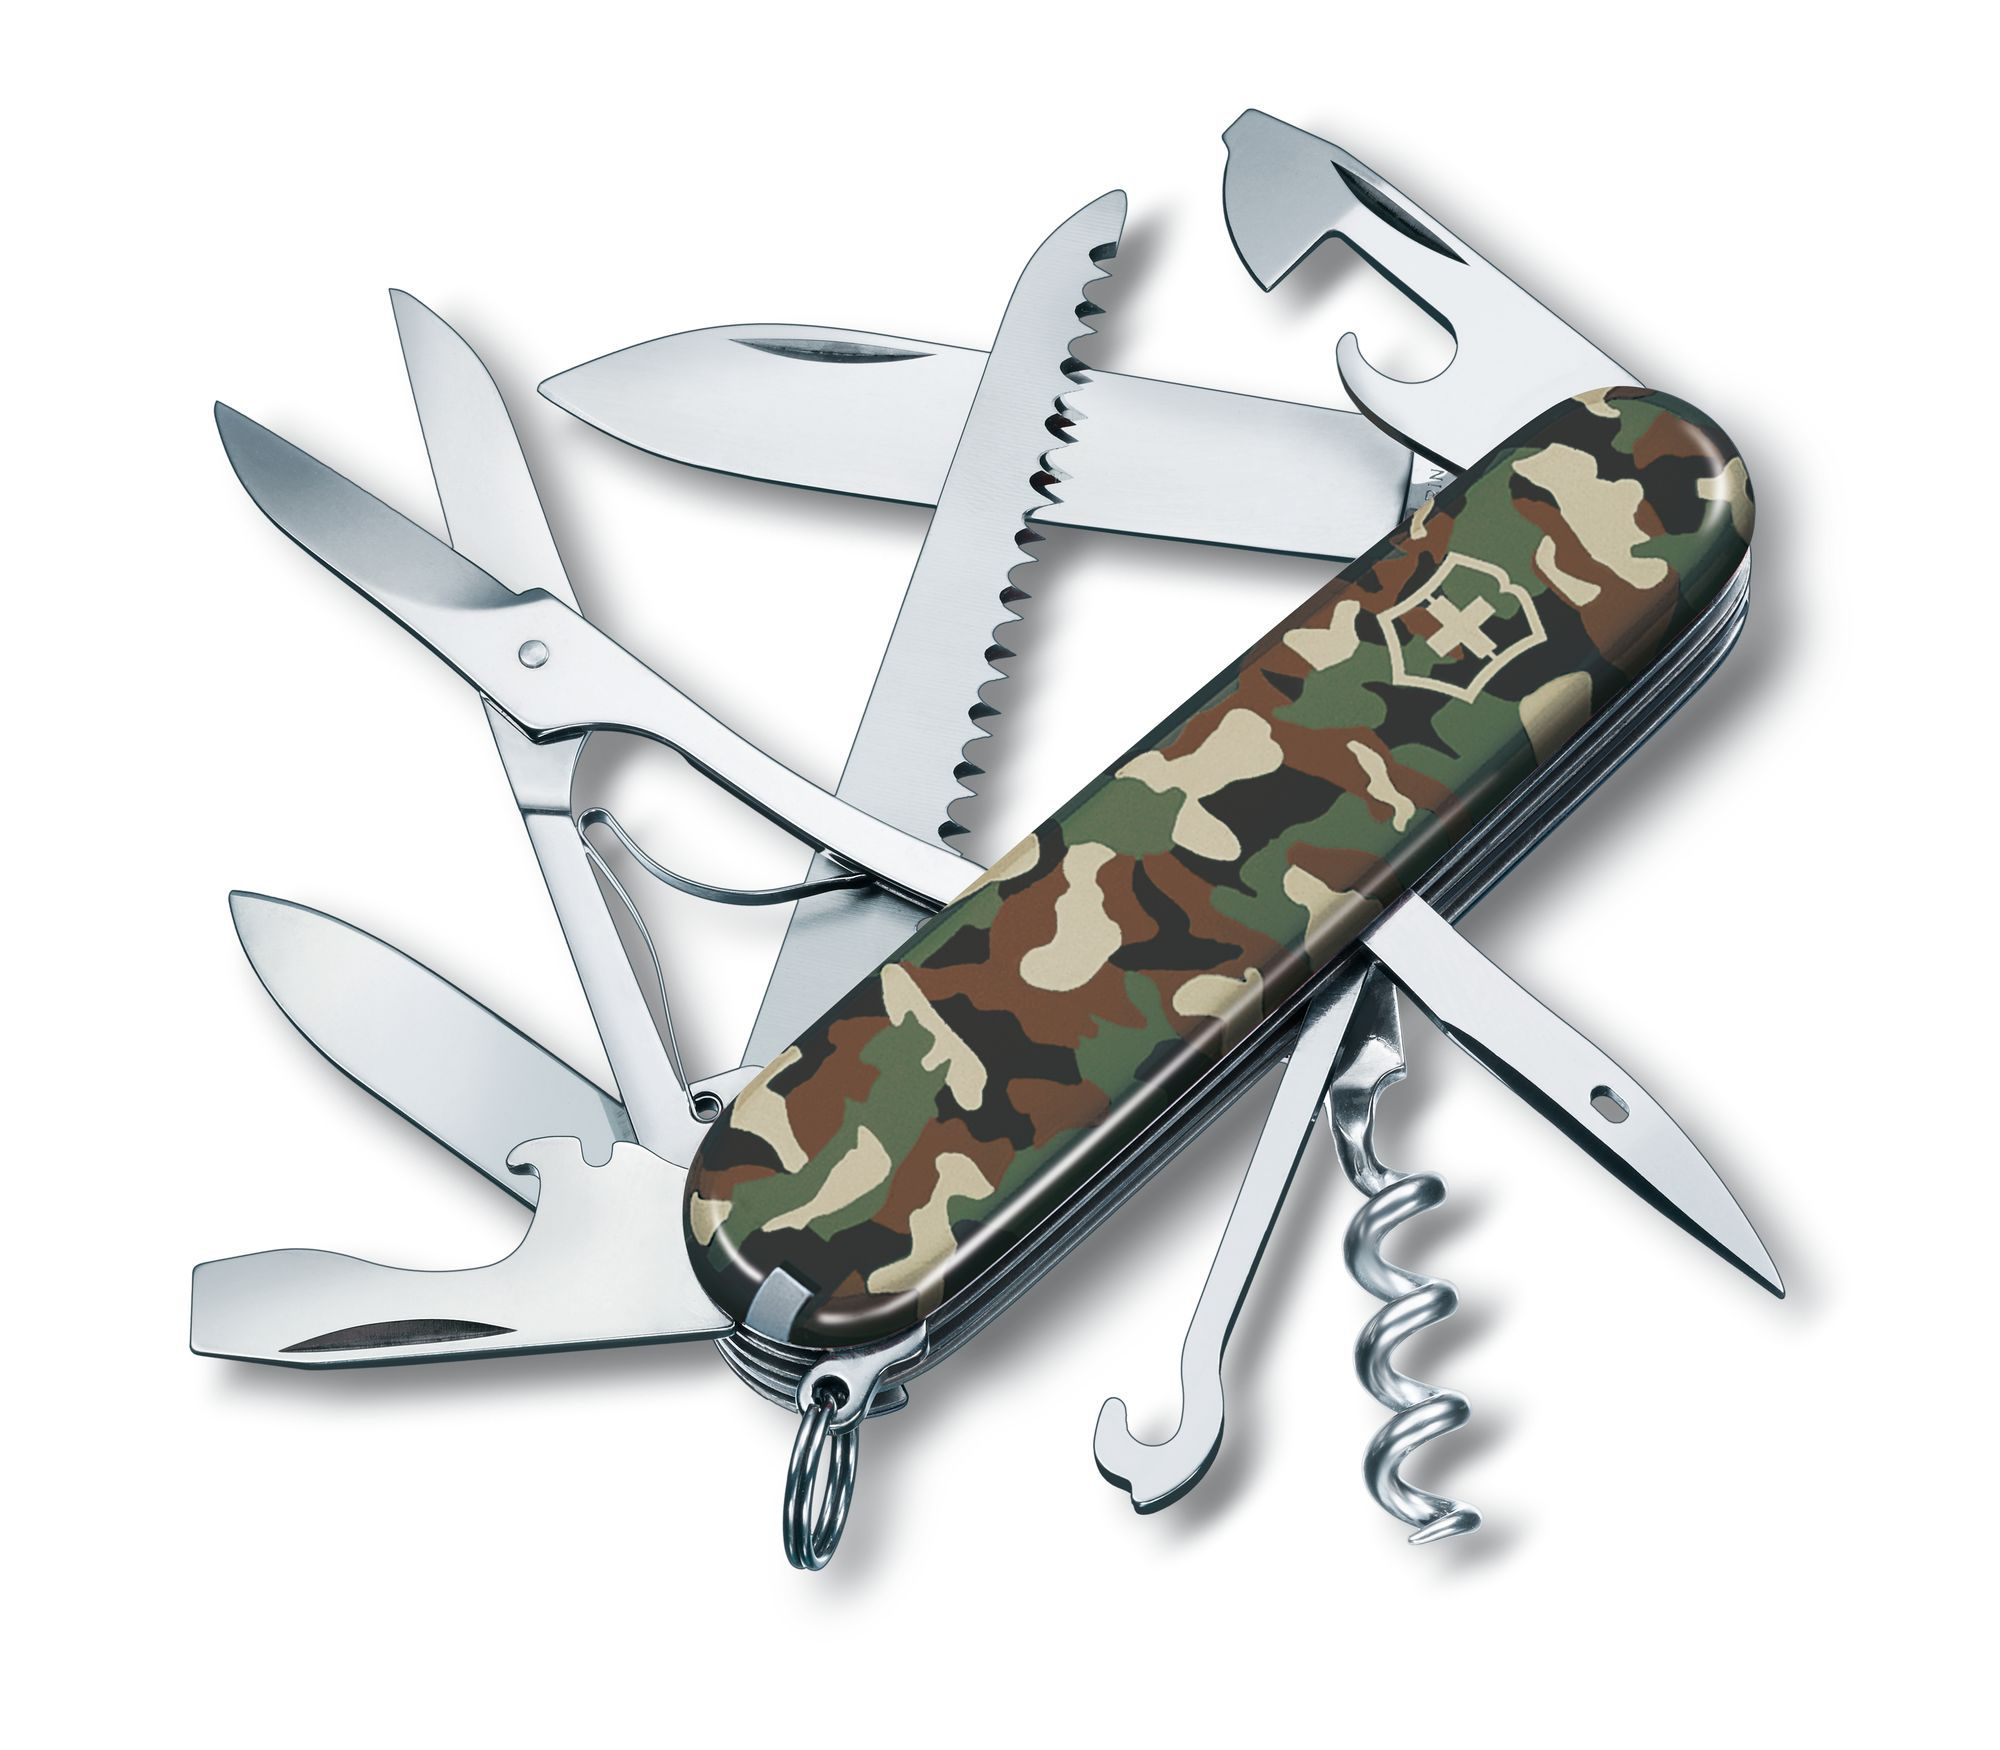 Canivete de bolso para caça Camuflado - Verde Exército - Victorinox